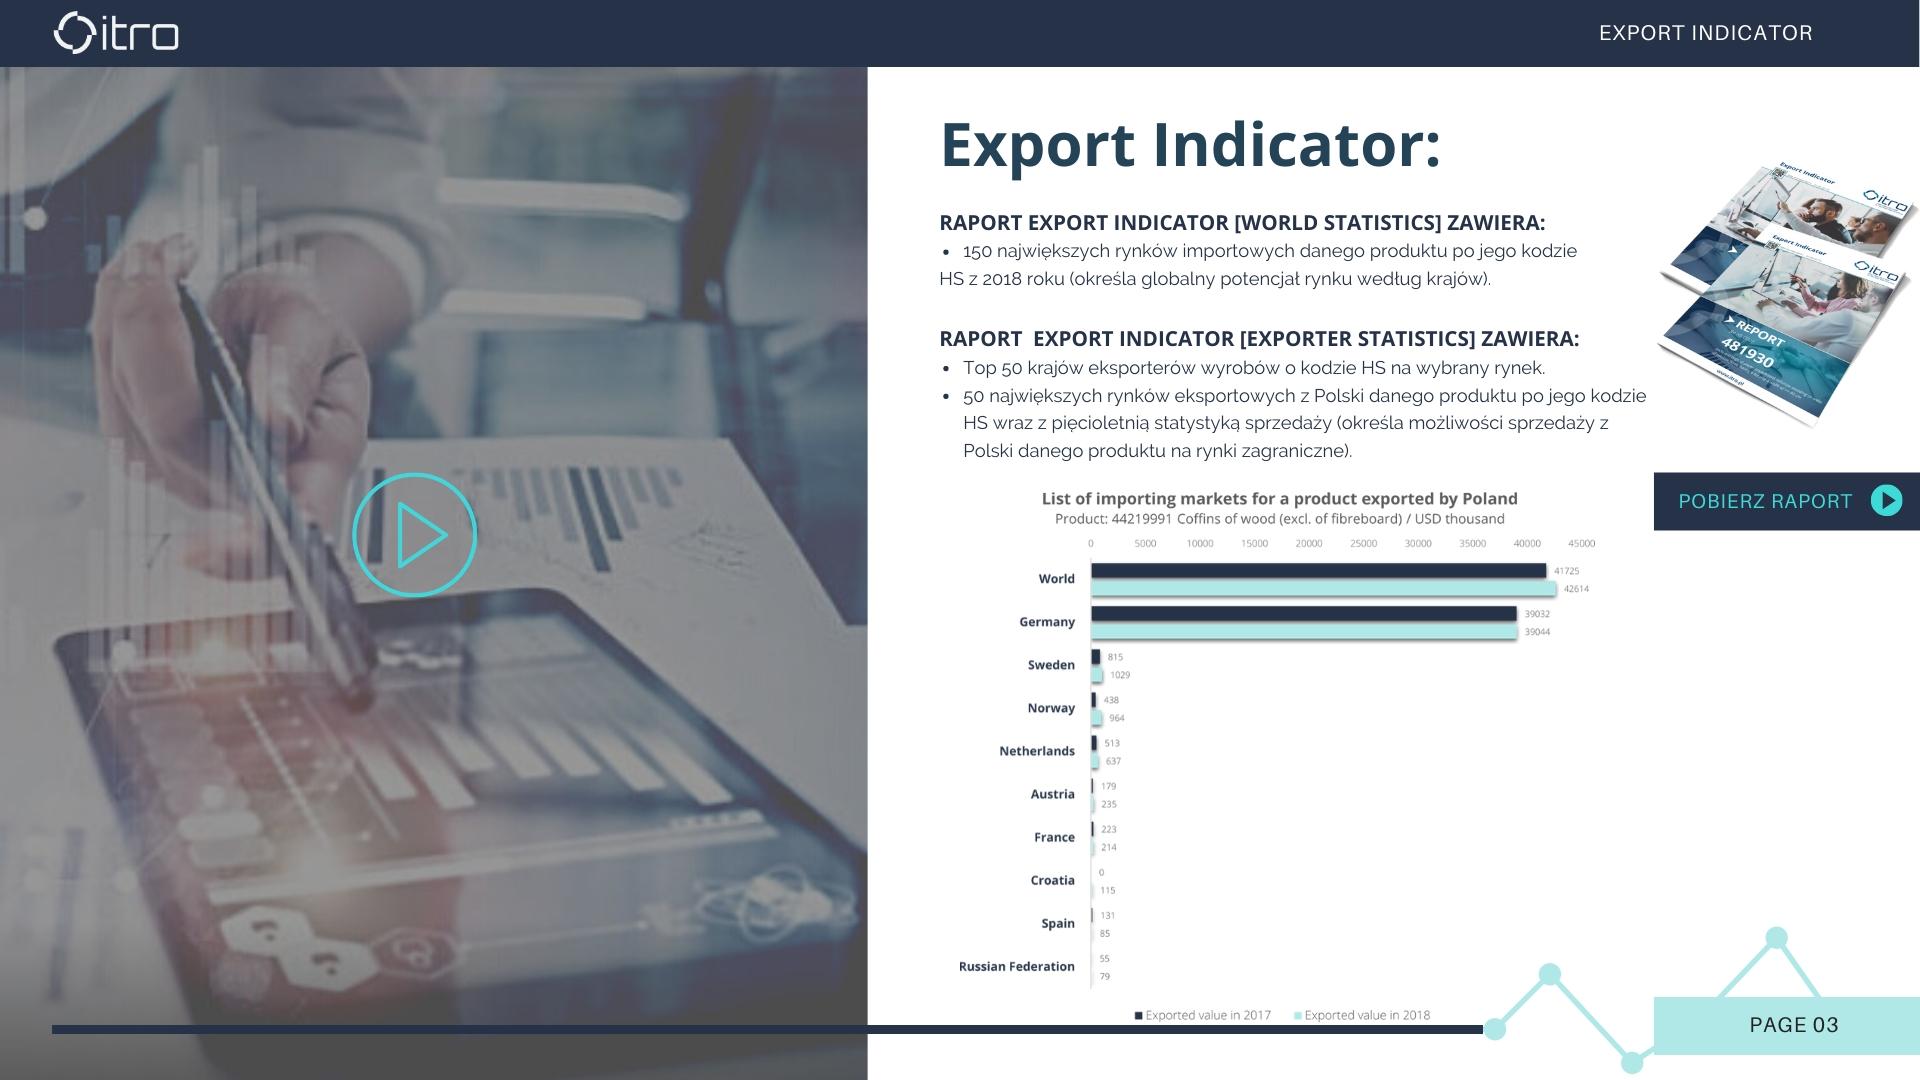 3_Professionalservicestointernationalizeyourbusiness_by ITRO_Export Indicator_2020